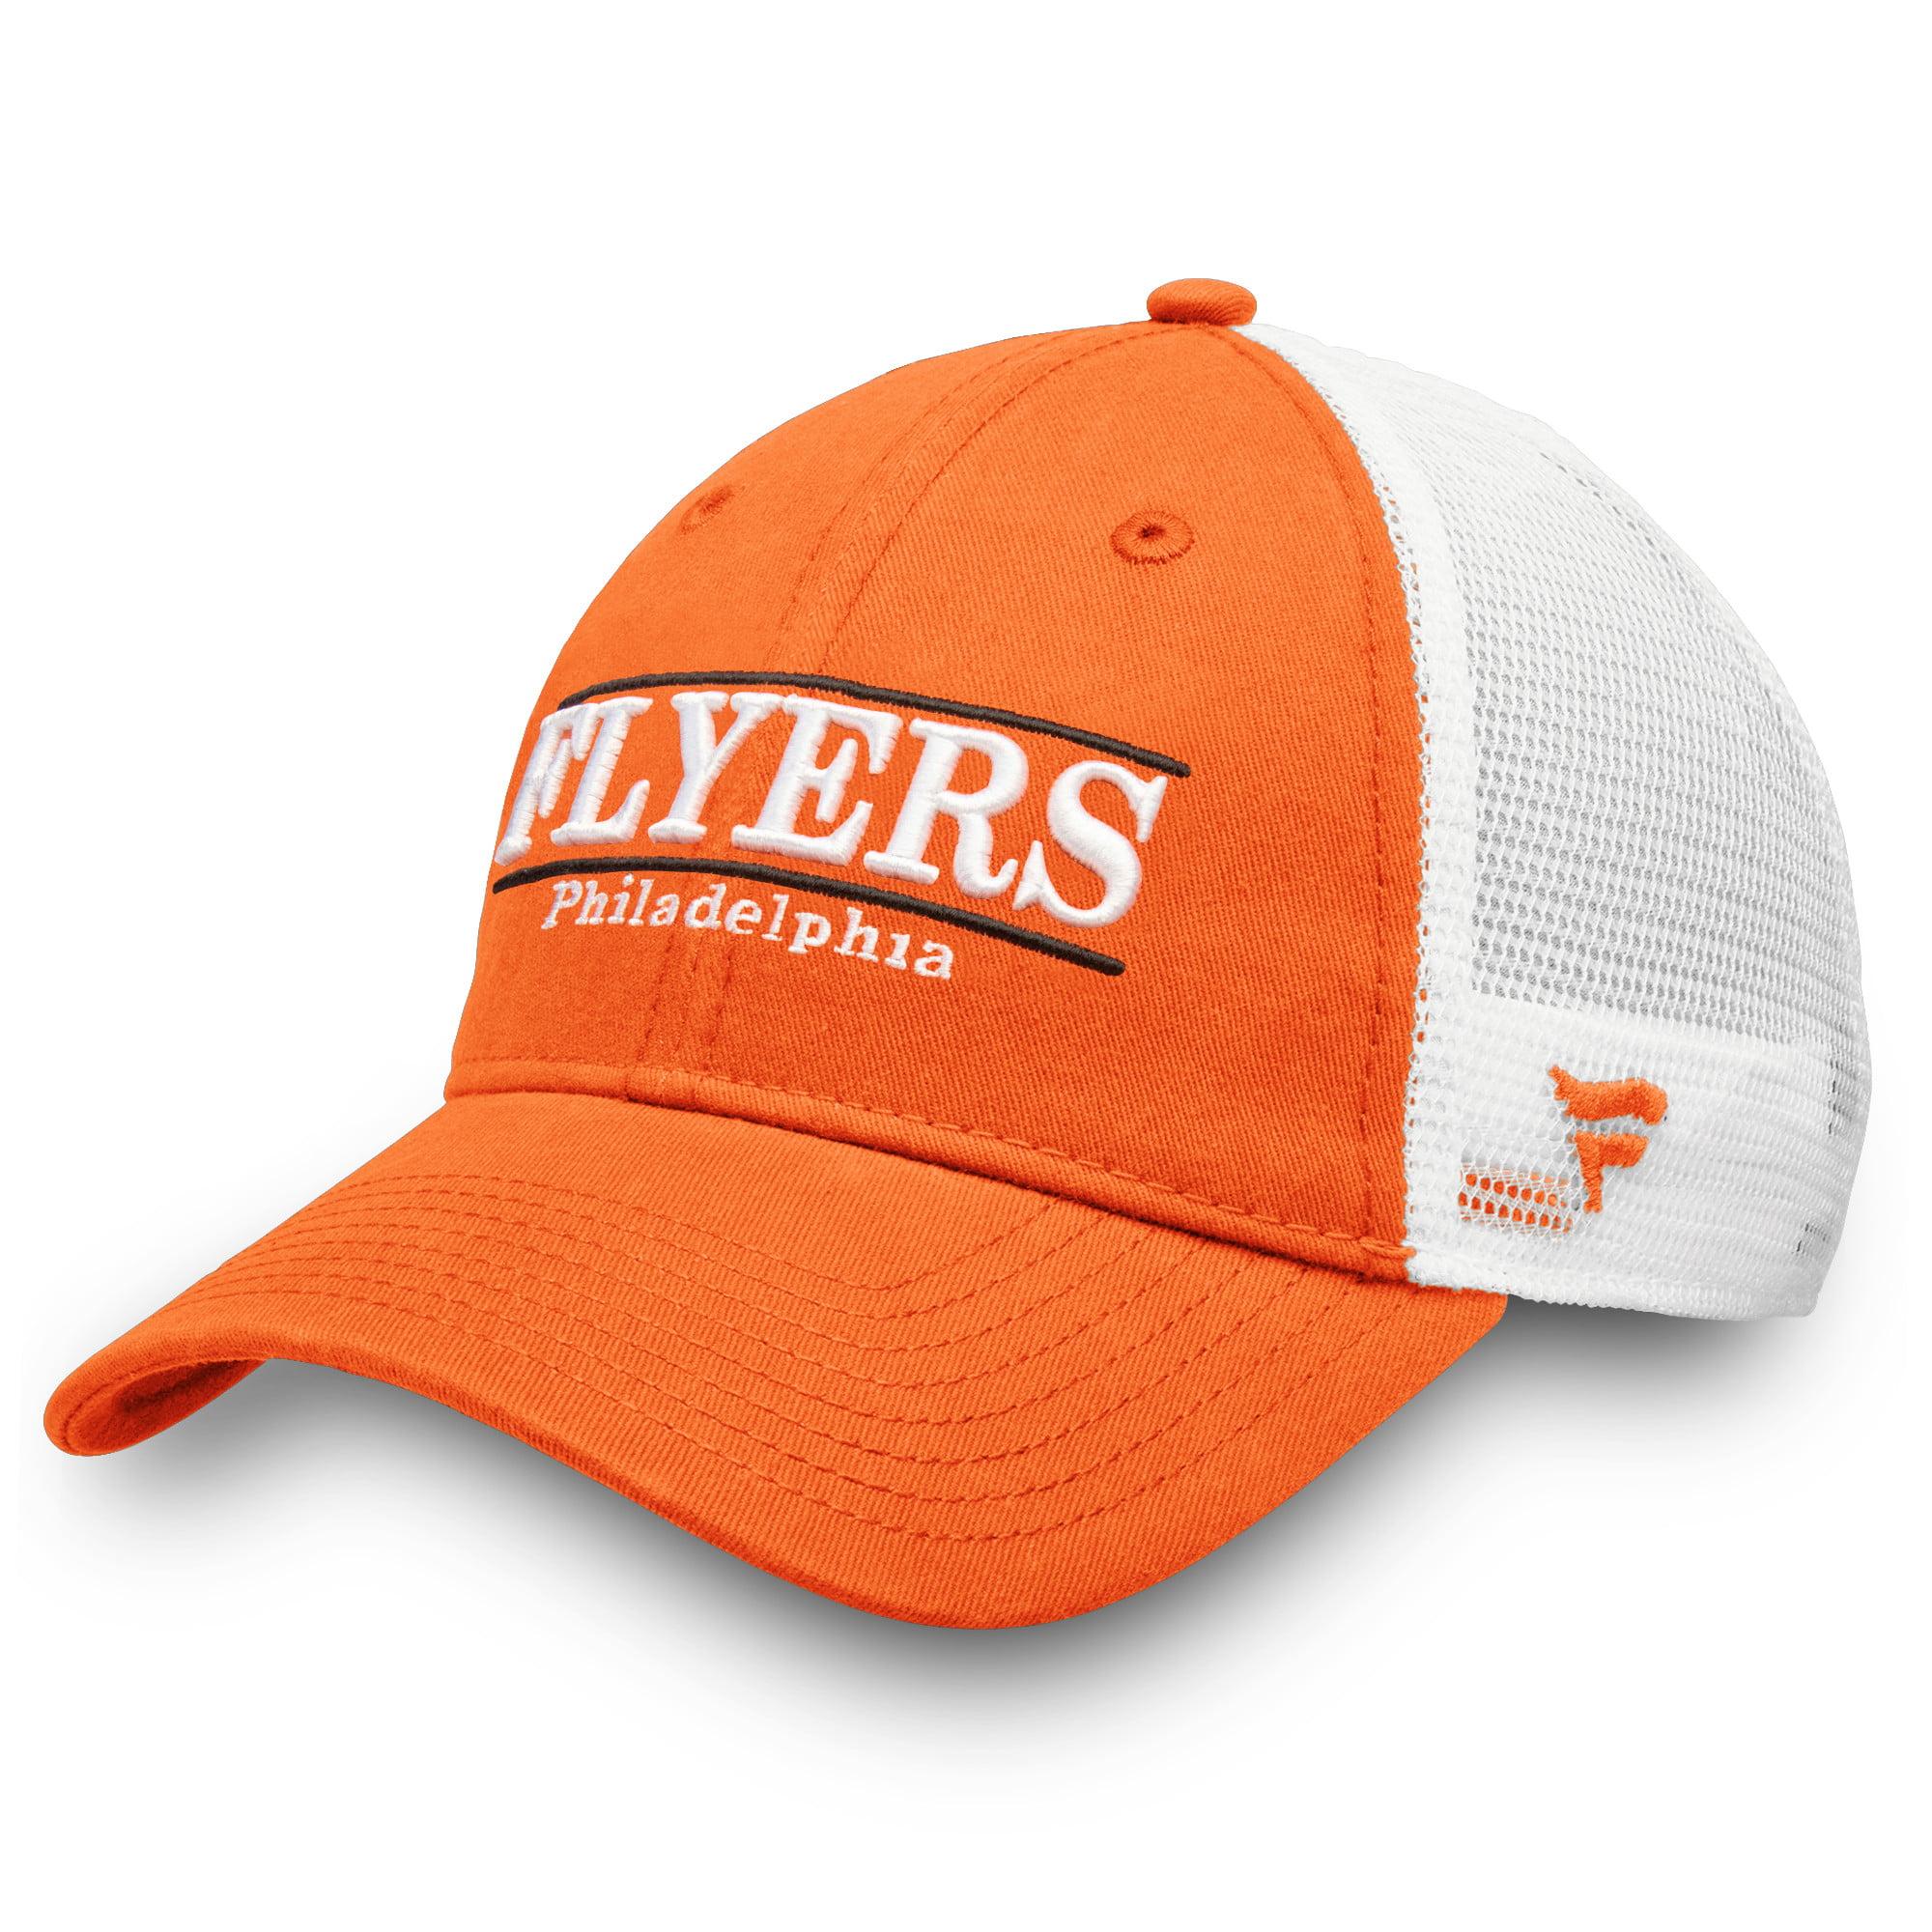 Philadelphia Flyers Fanatics Branded Trucker Team Color Adjustable Hat - Orange - OSFA